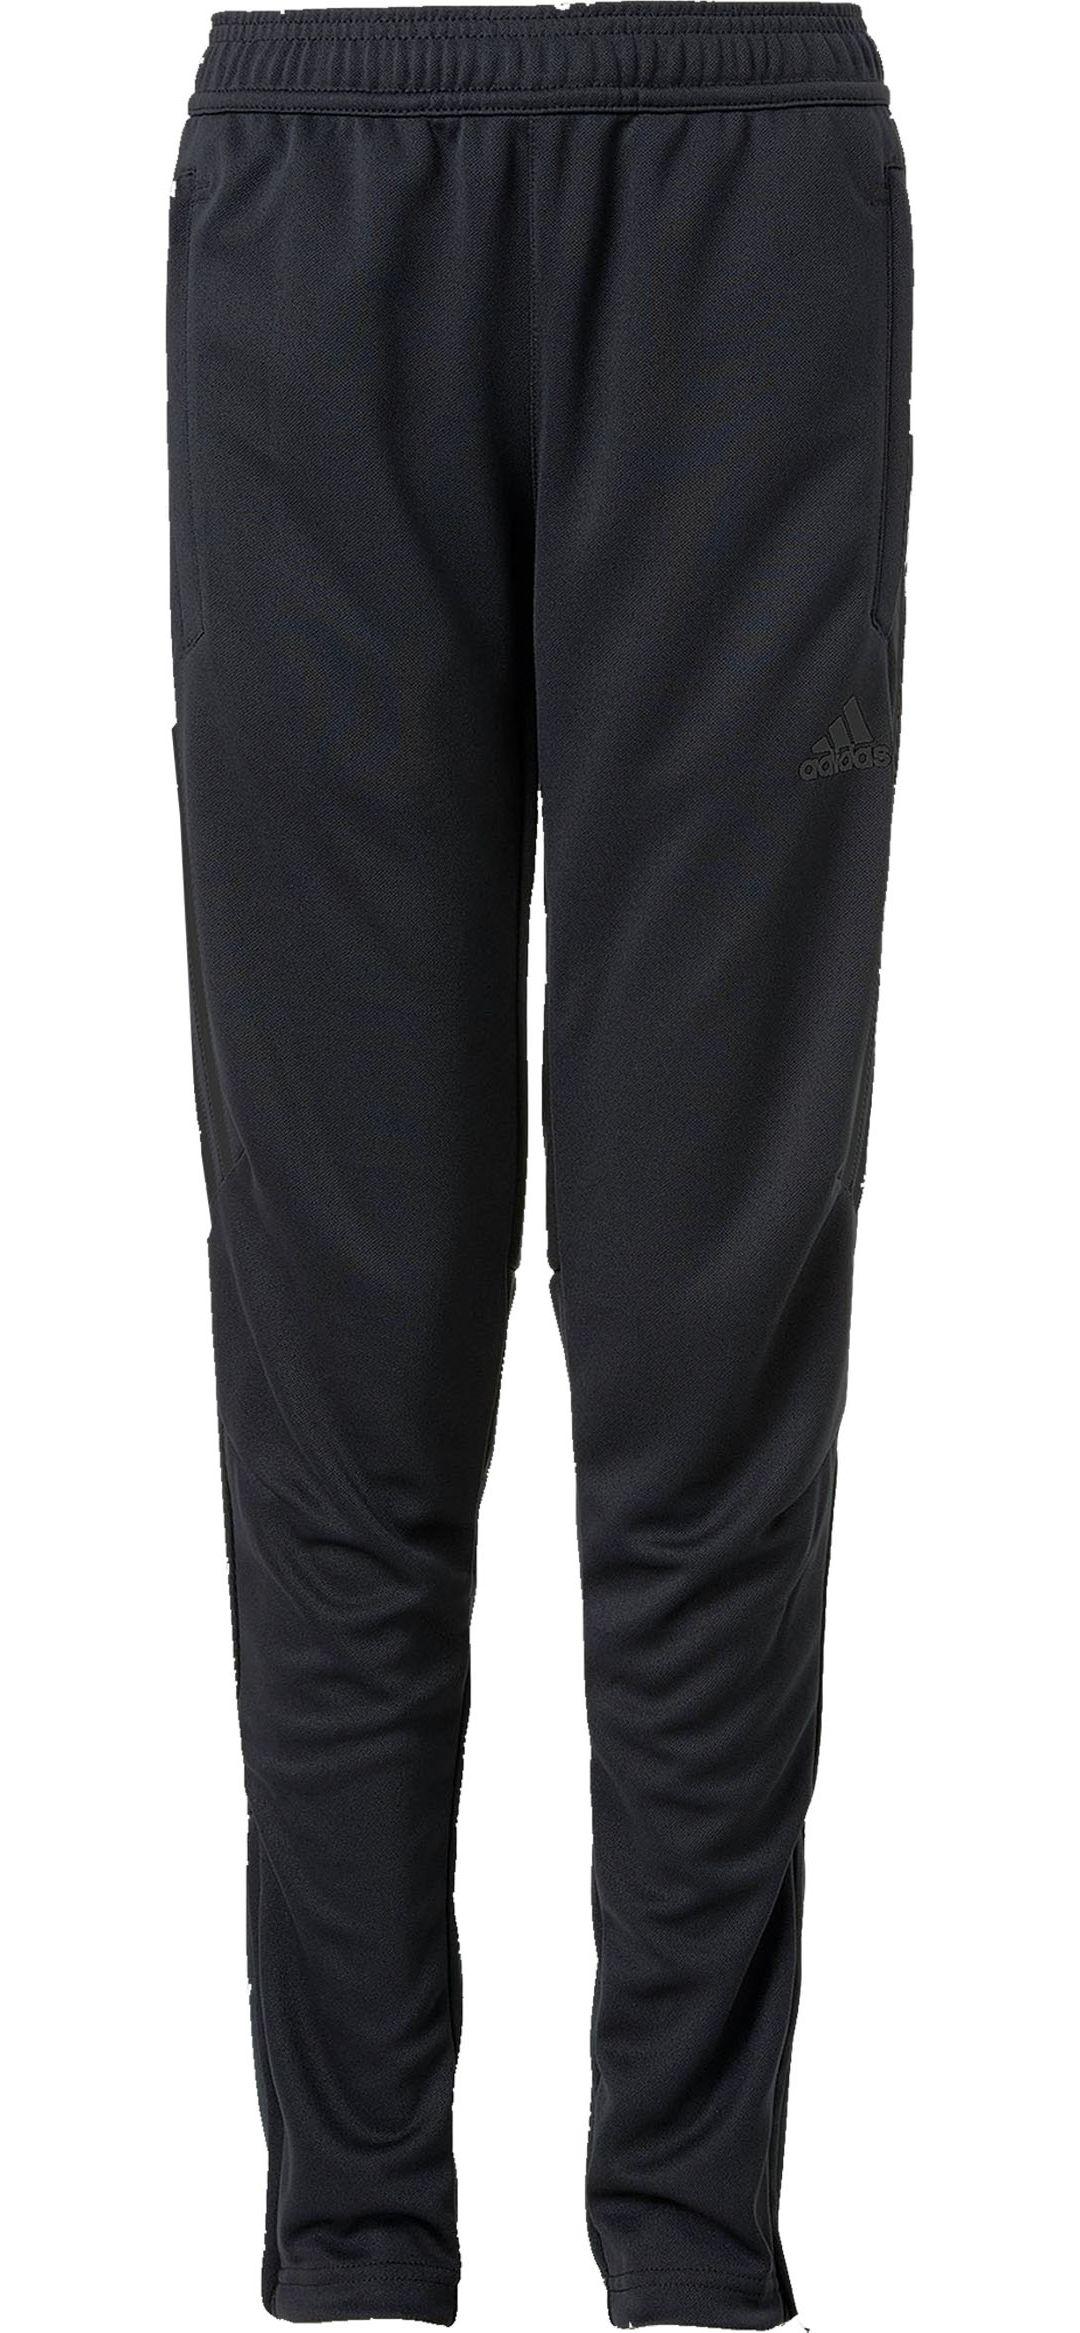 Boy's Medium Adidas Black & Gold Pants